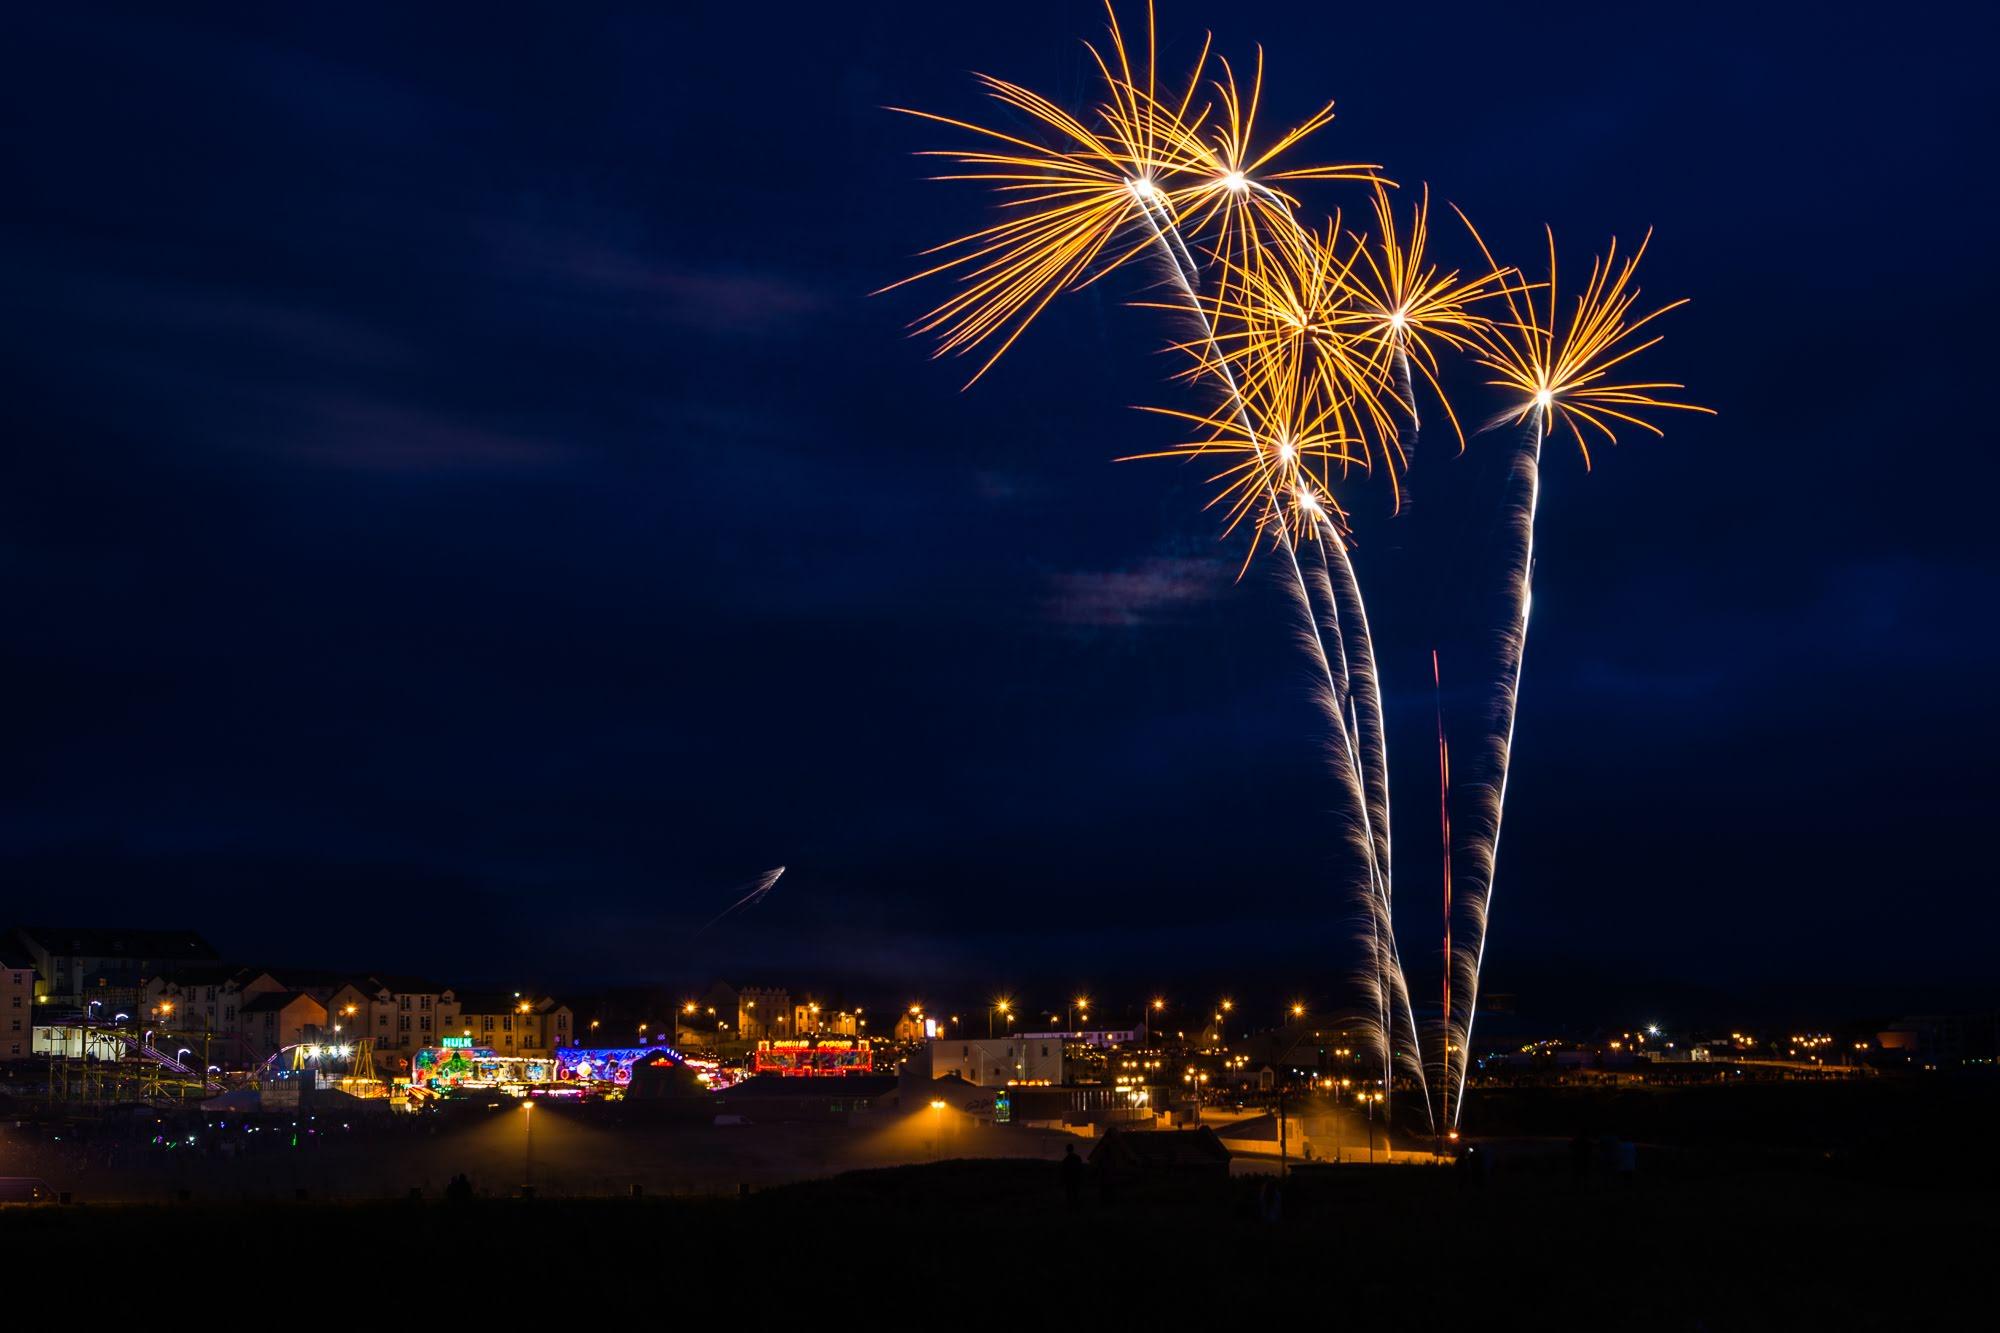 Fireworks 2014 - pic Claudio SalviatoFireworks 2014 - pic Claudio Salviato